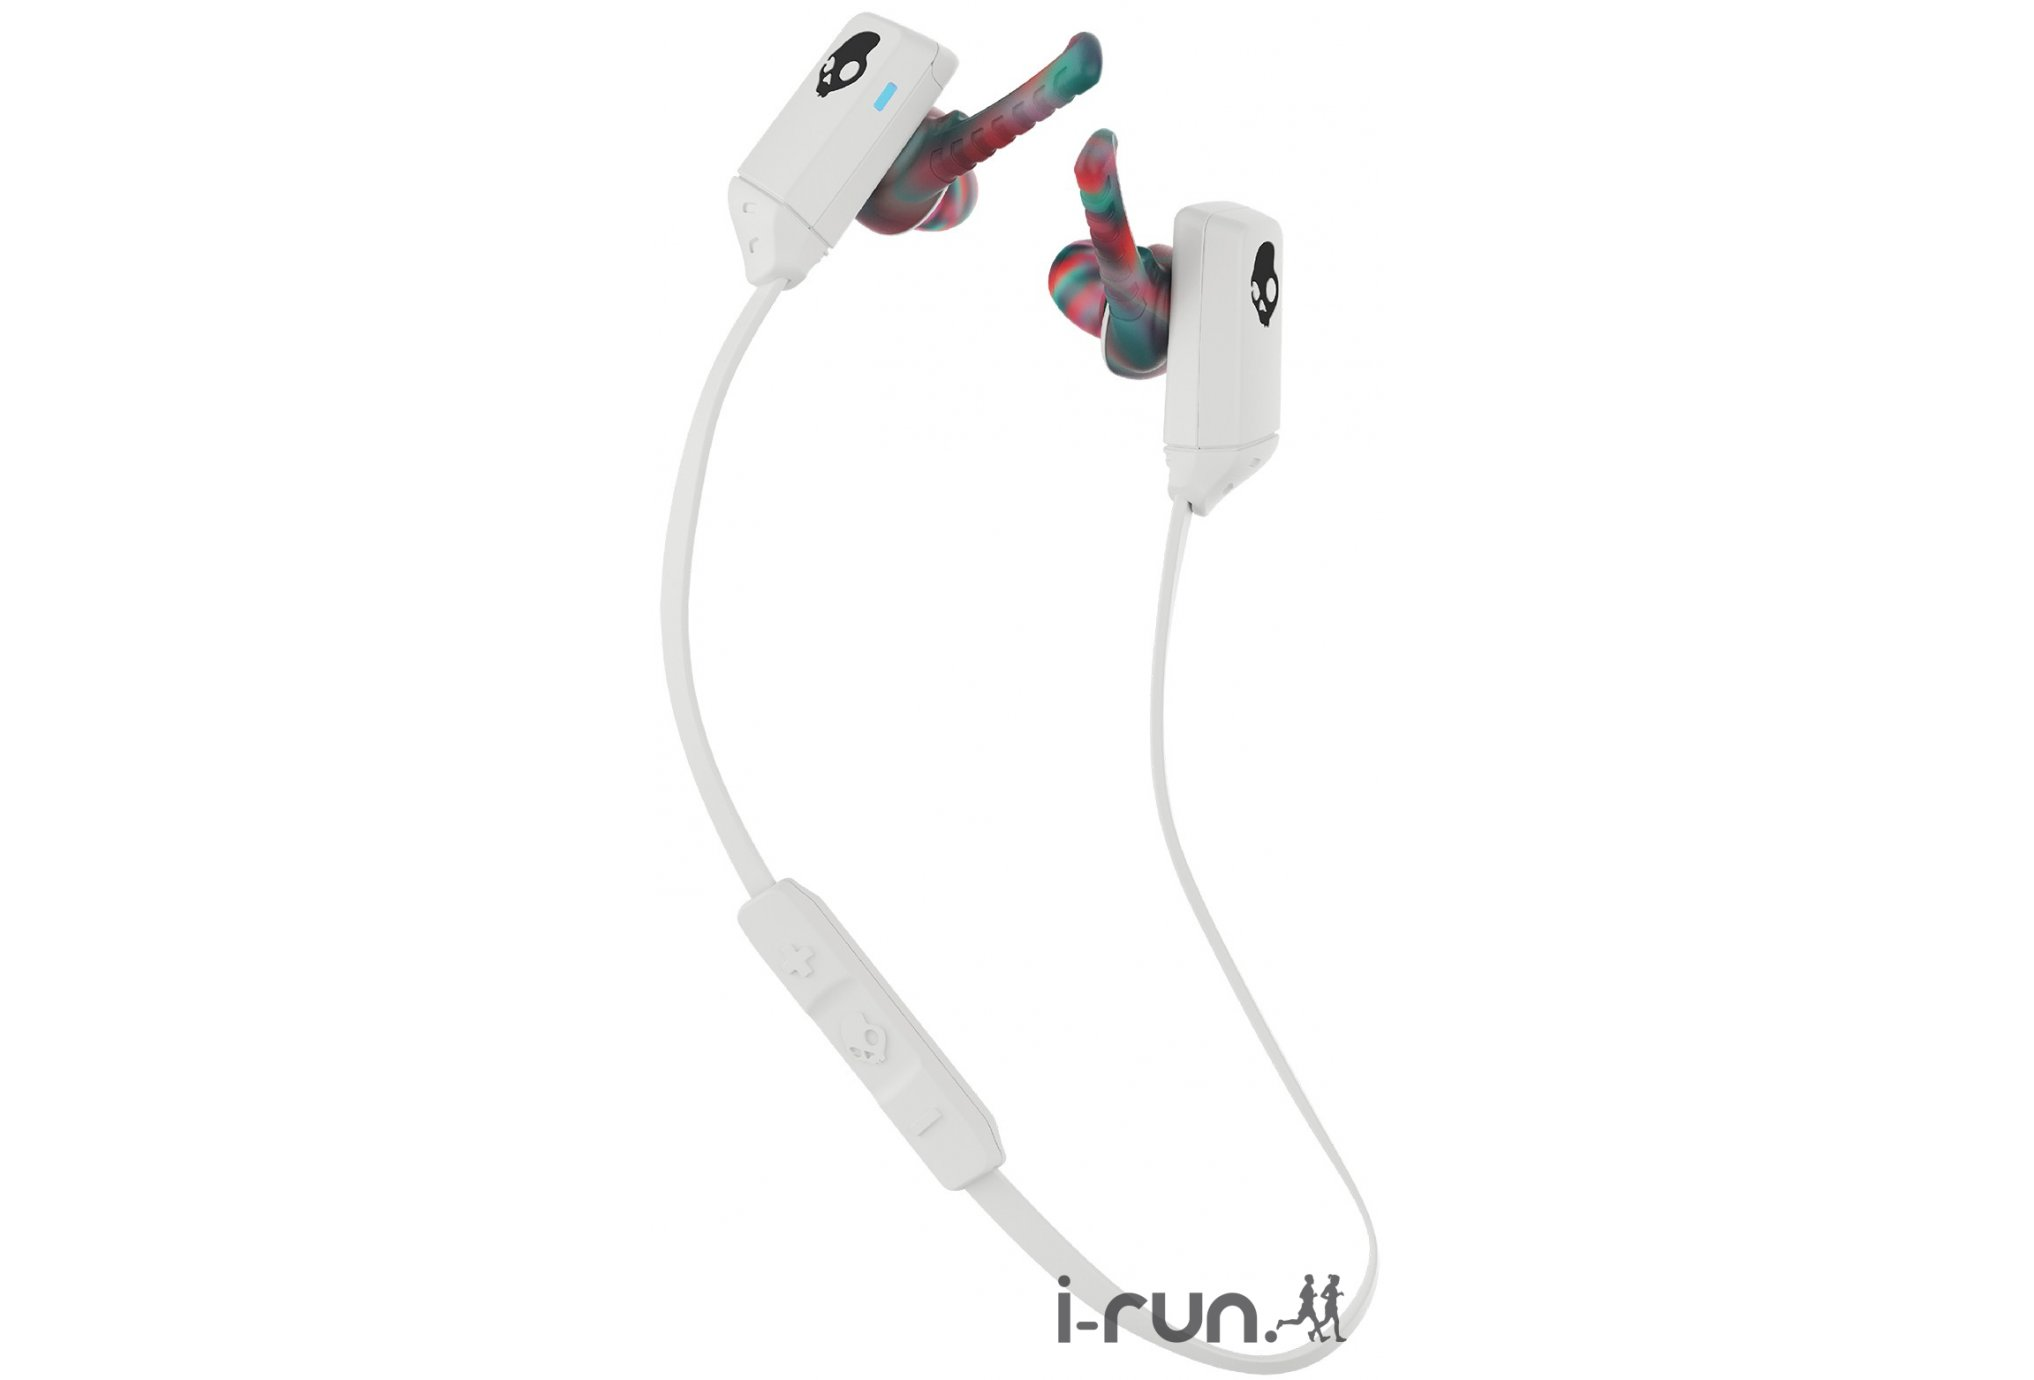 SkullCandy Auriculares XTFREE Sport Performance Bluetooth Casques / lecteurs mp3